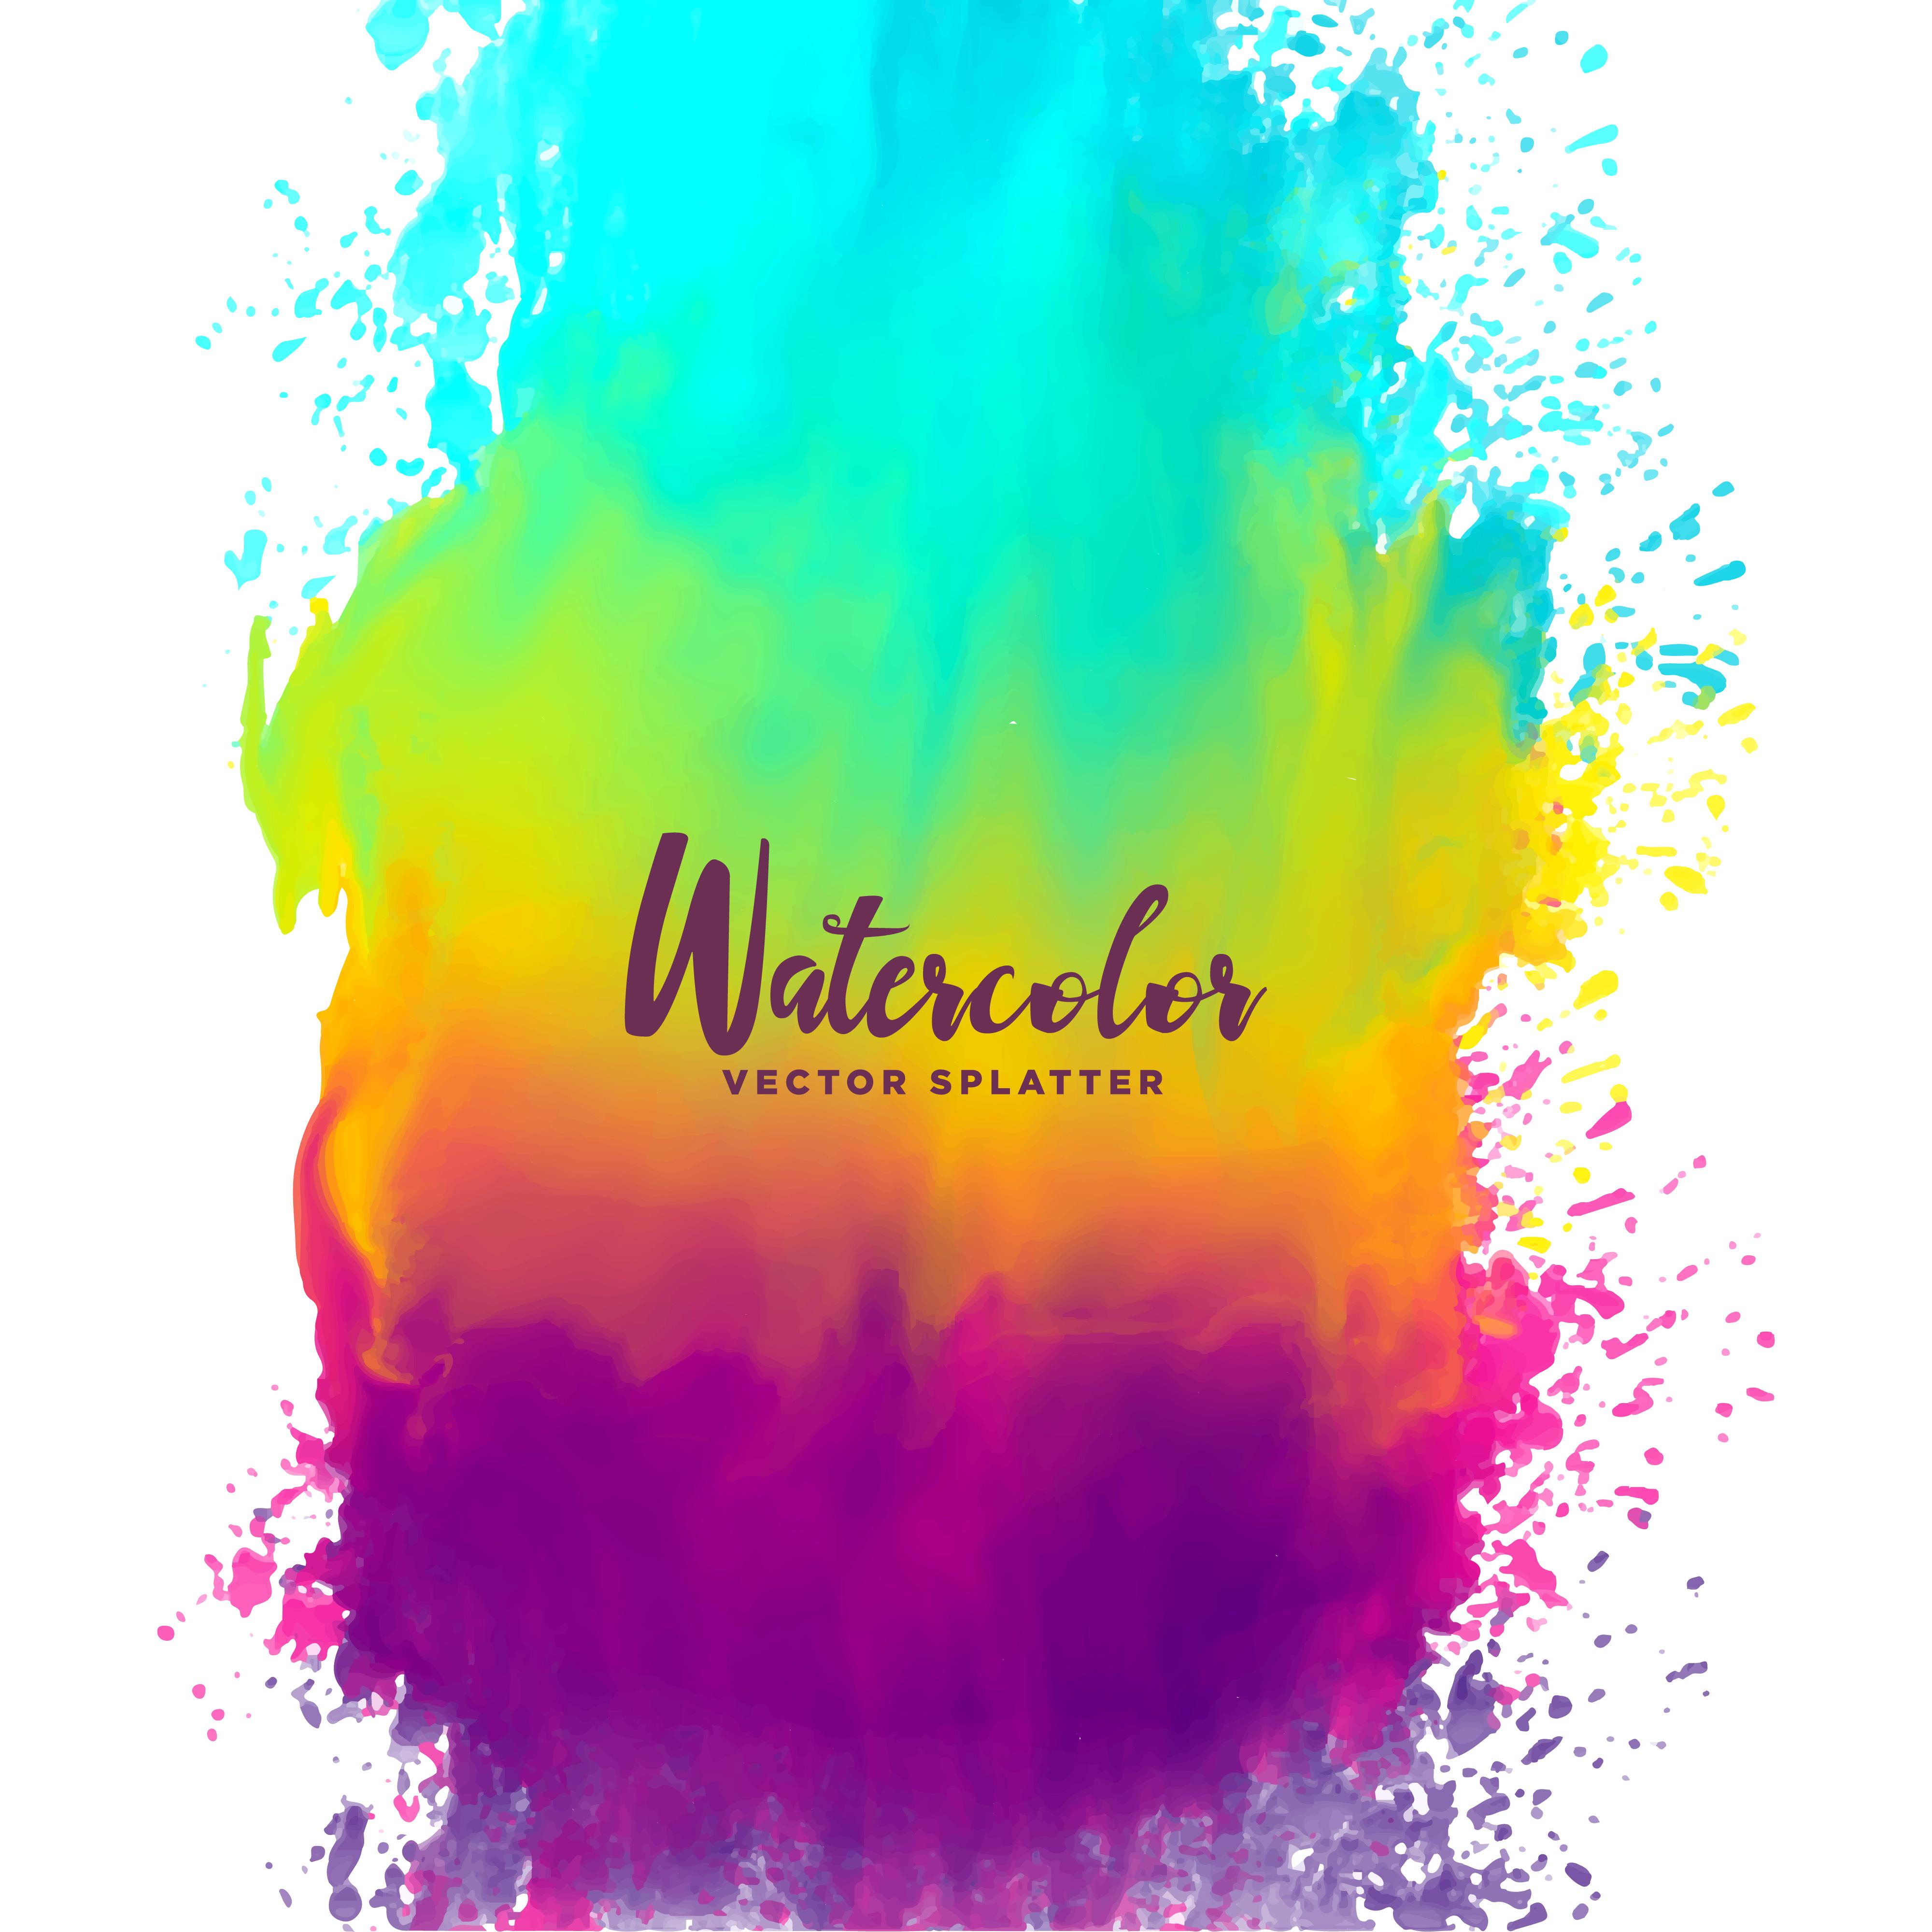 4000x4000 Watercolor Splash Vector